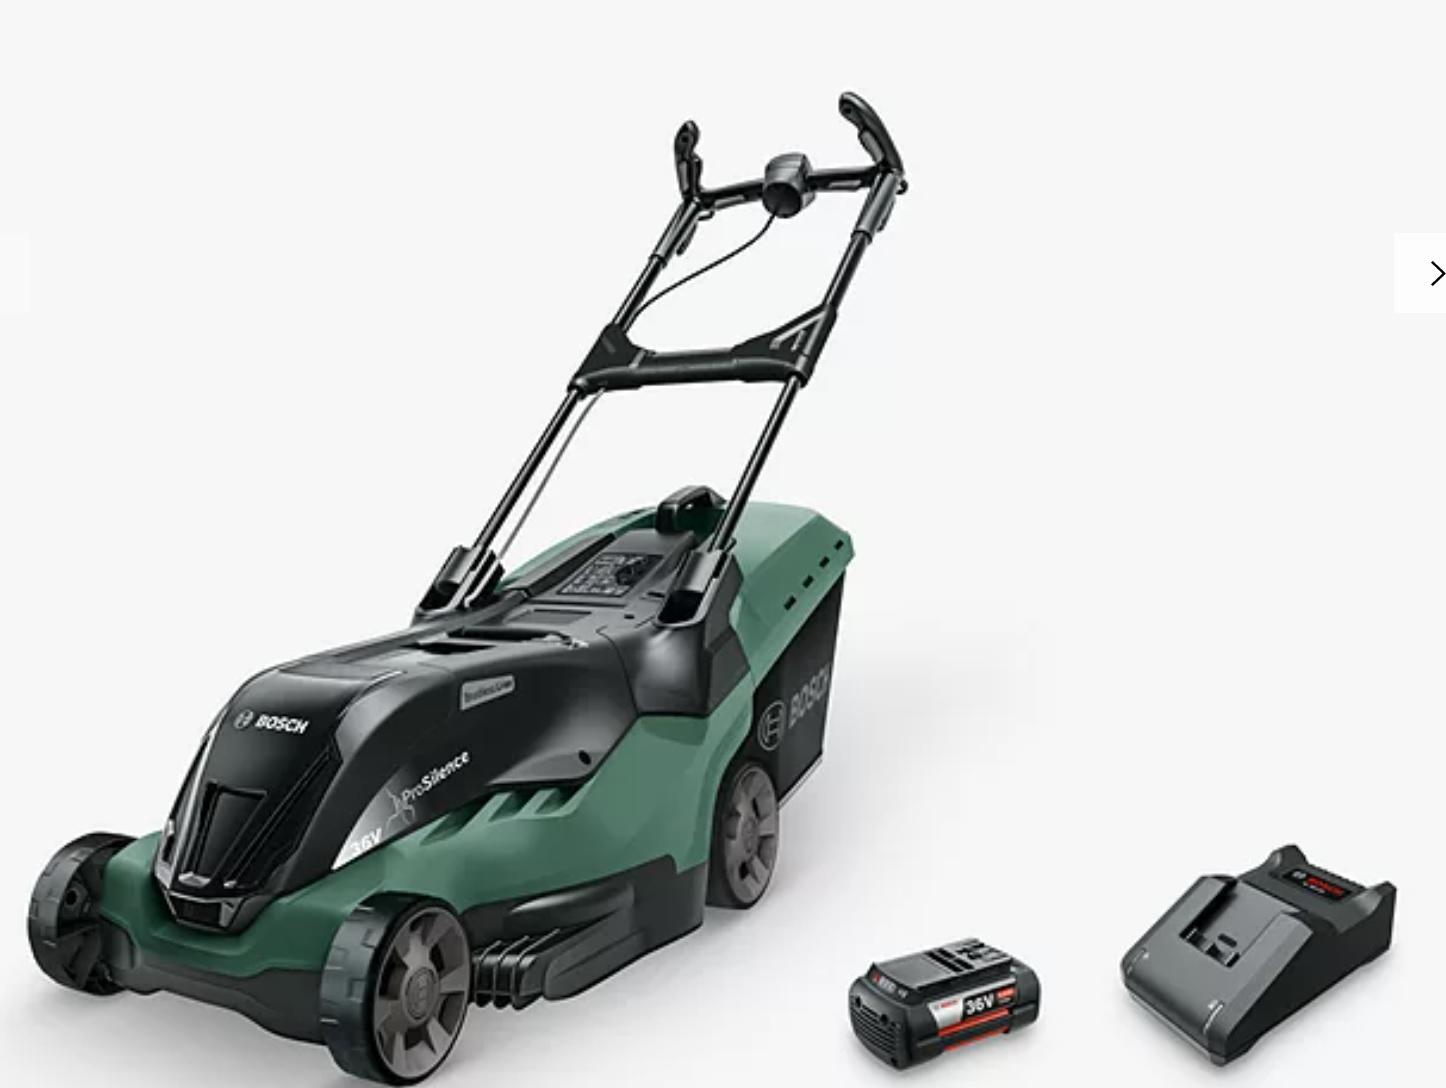 Bosch Advanced Rotak 36V Cordless 46cm Lawn Mower Model 36-850 - £379.89 (Membership Required) @ Costco